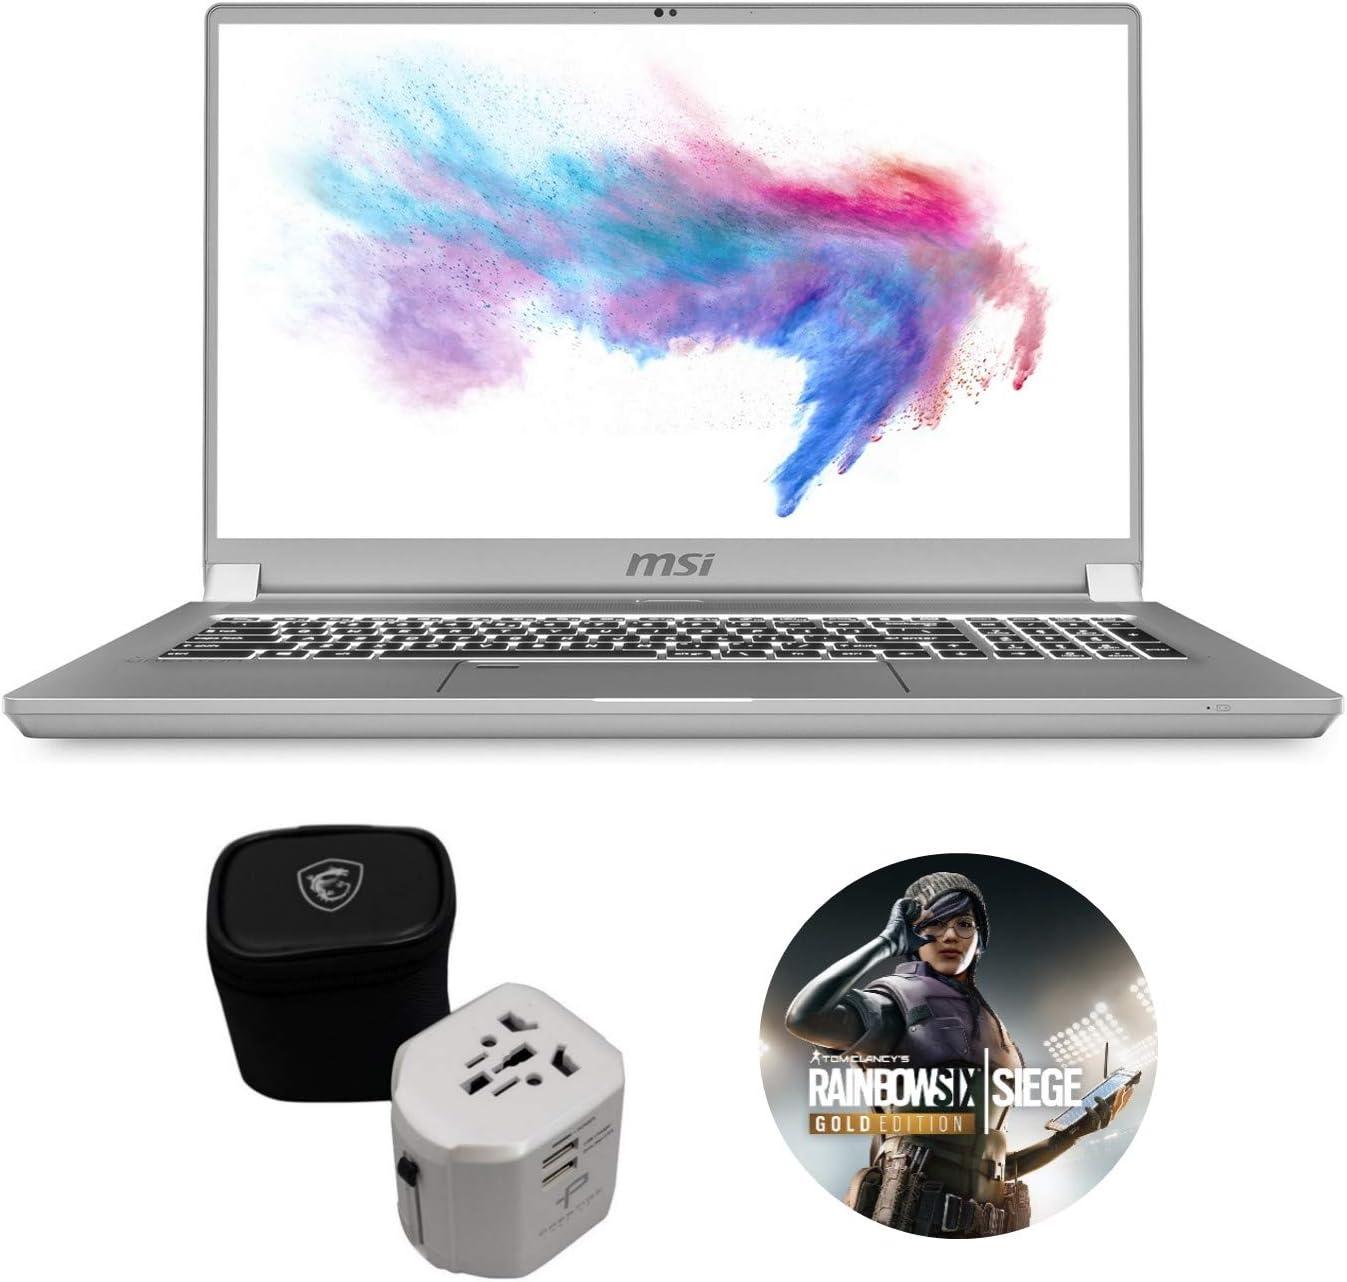 "MSI Creator 17 A10SE-256 (i7-10875H, 16GB RAM, 512GB NVMe SSD, RTX 2060 6GB, 17.3"" Full HD, Windows 10 Pro) Professional Laptop"